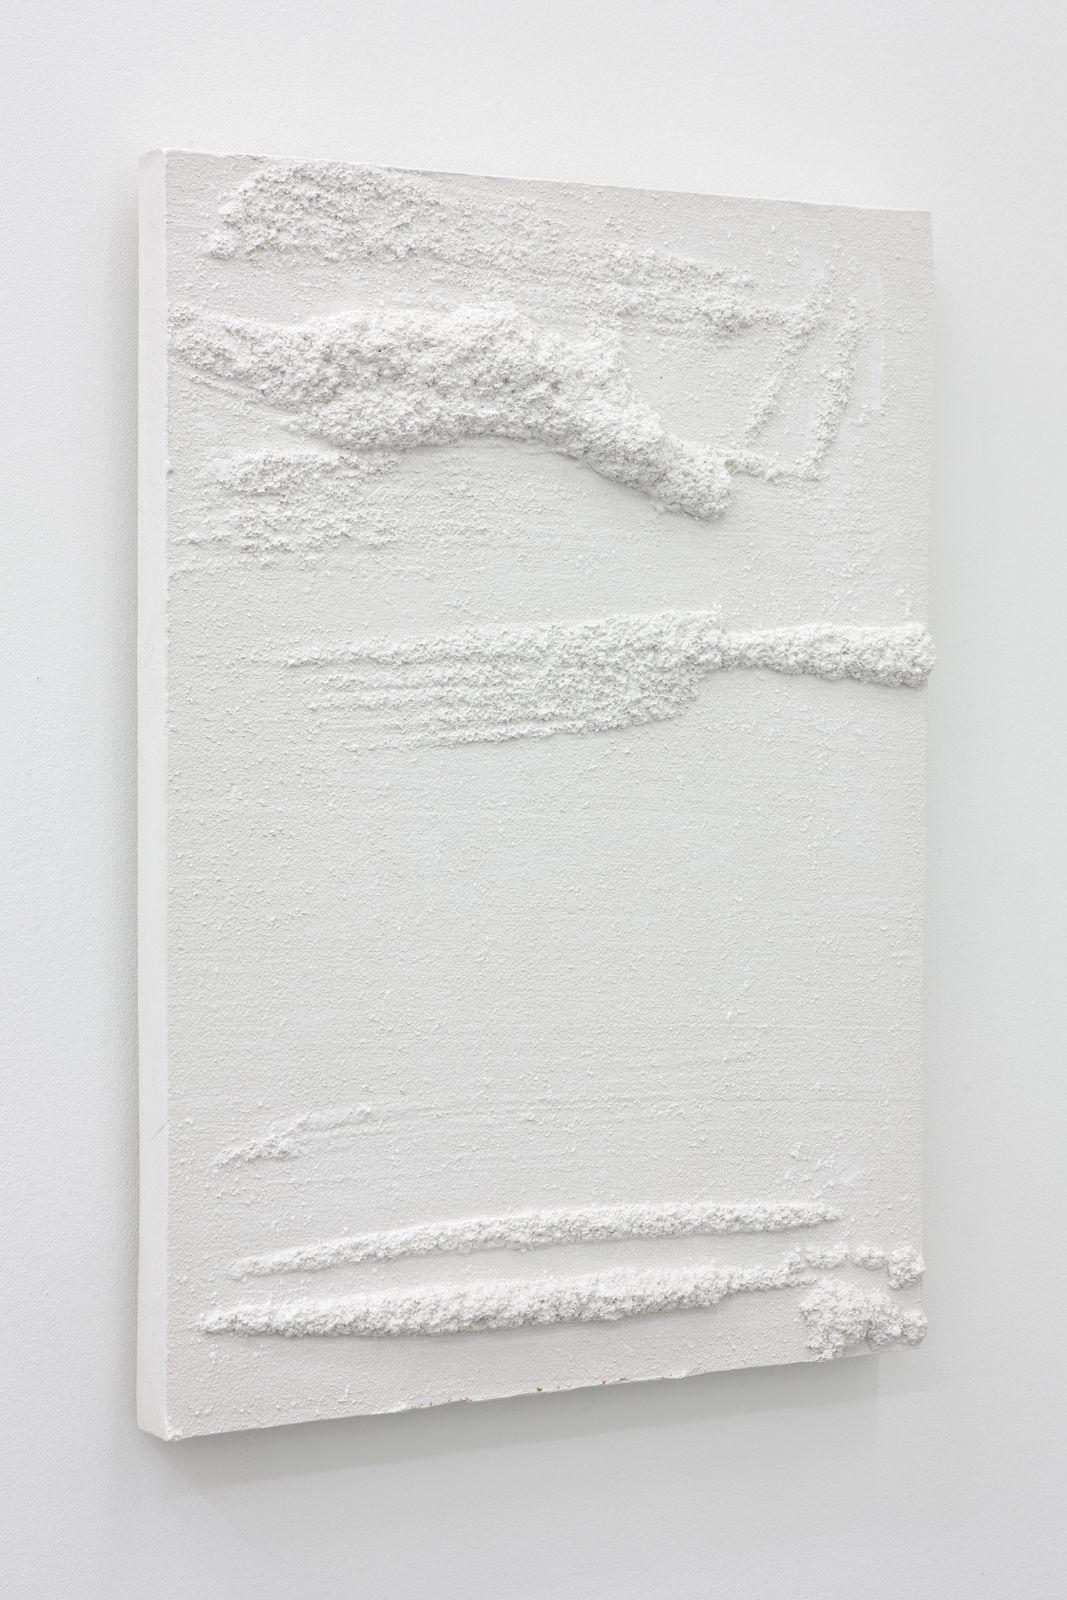 Untitled, 2012, plaster, 60 x 45 x 5,5 cm